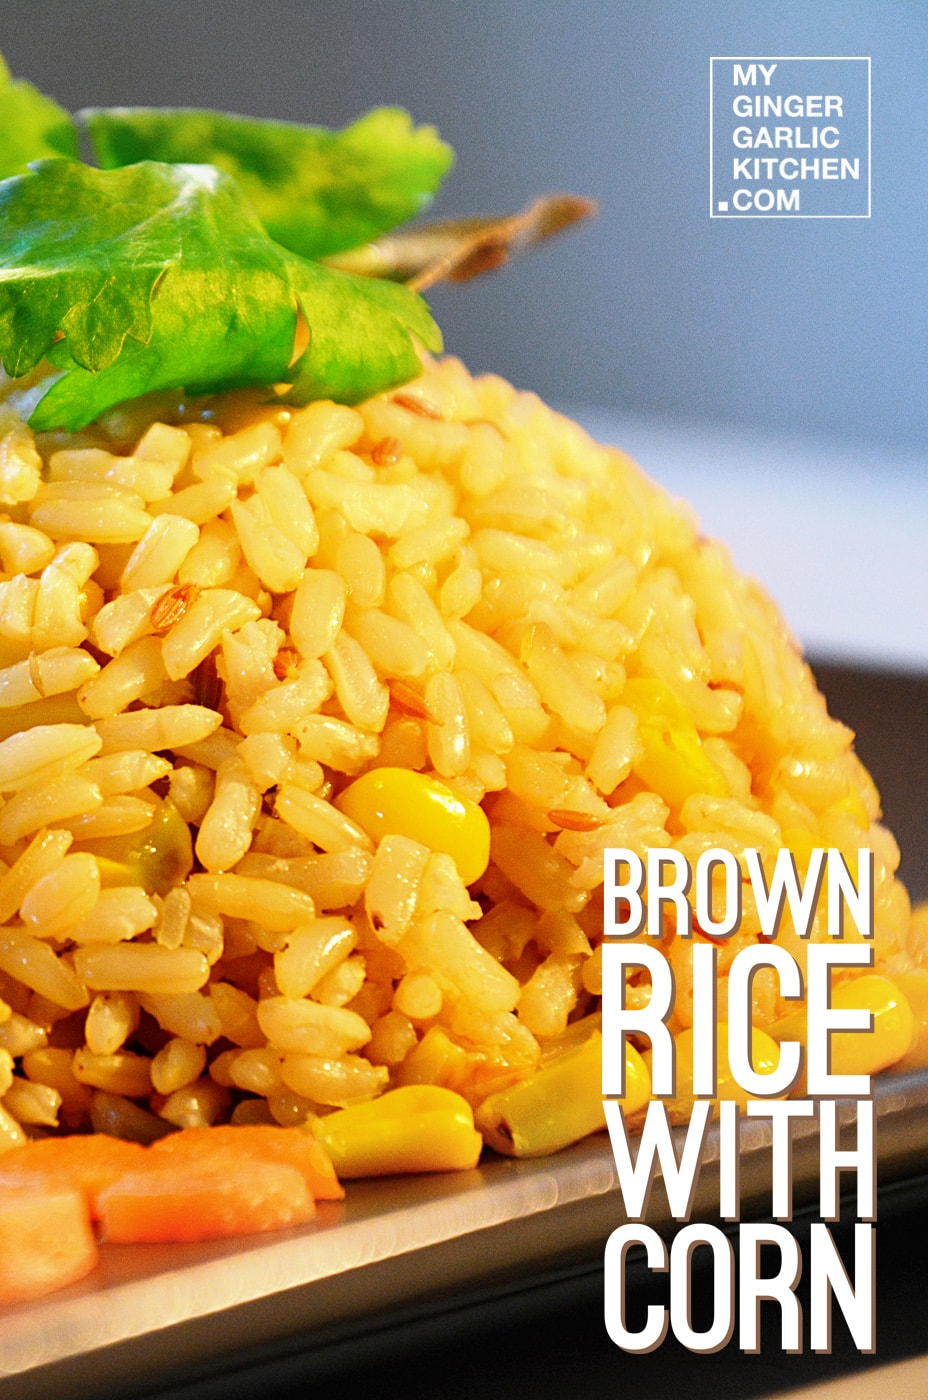 Image - recipe brown rice with corn anupama paliwal my ginger garlic kitchen 4 copy